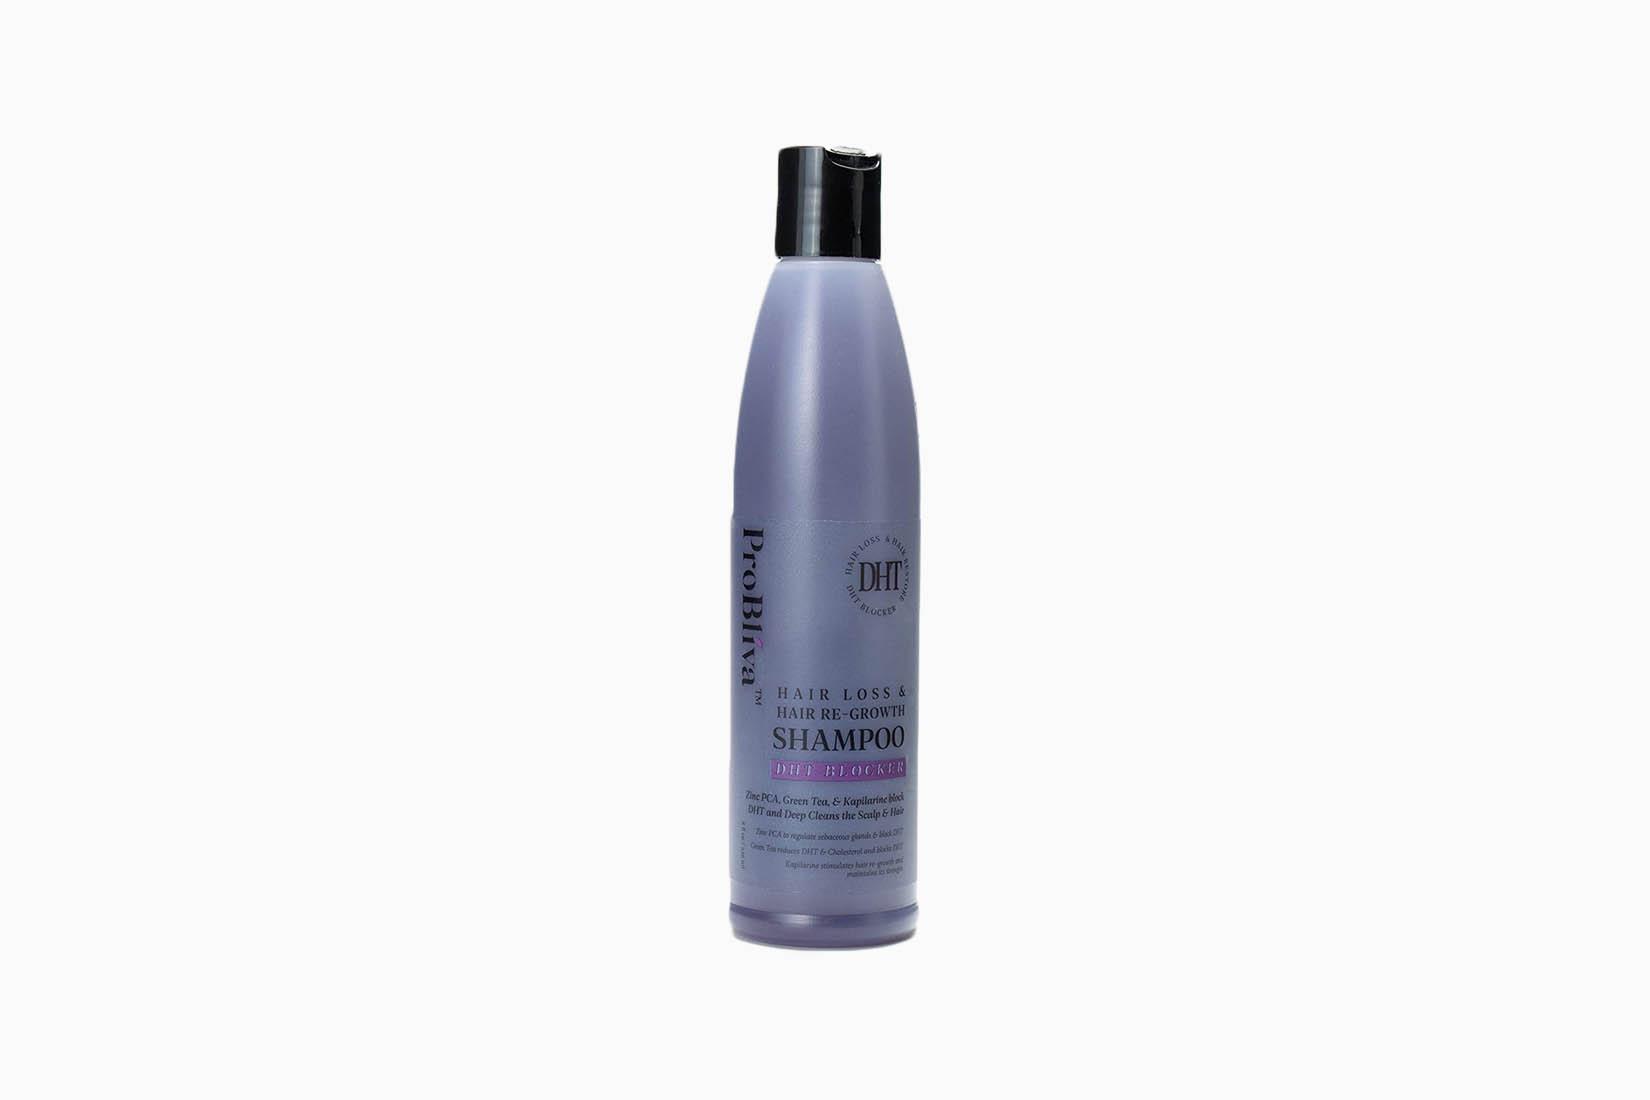 Best Hair Pura Dor Shampoo Men Probliva Review - Luxe Digital